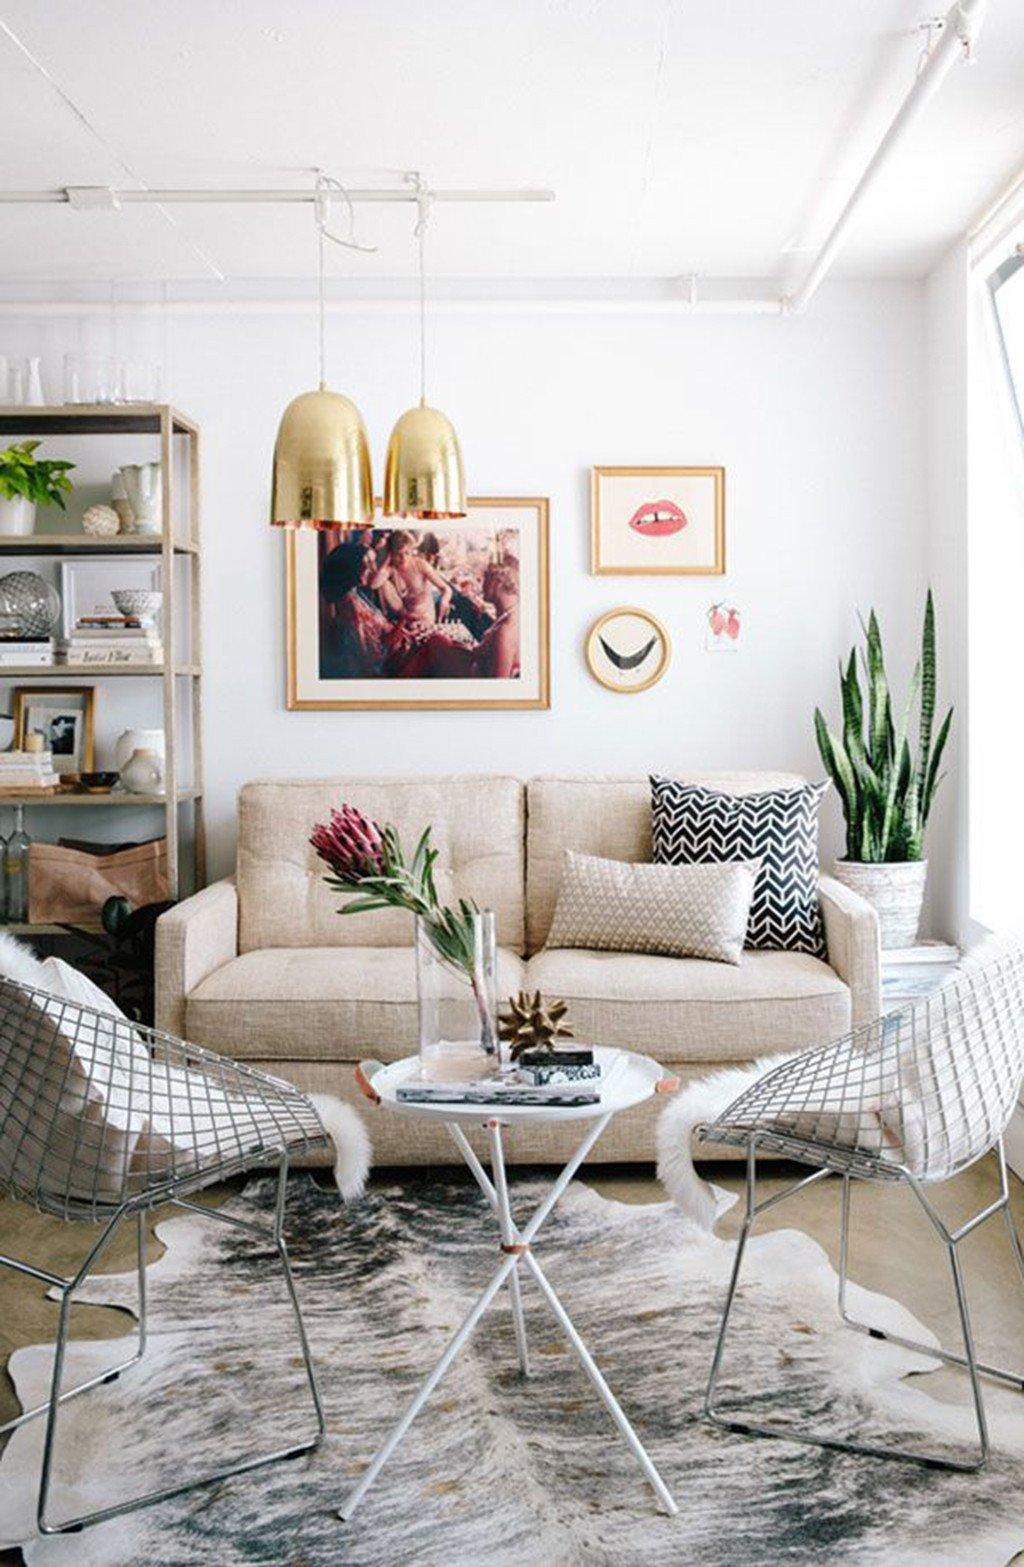 Small Living Room Interior Design 50 Best Small Living Room Design Ideas for 2017